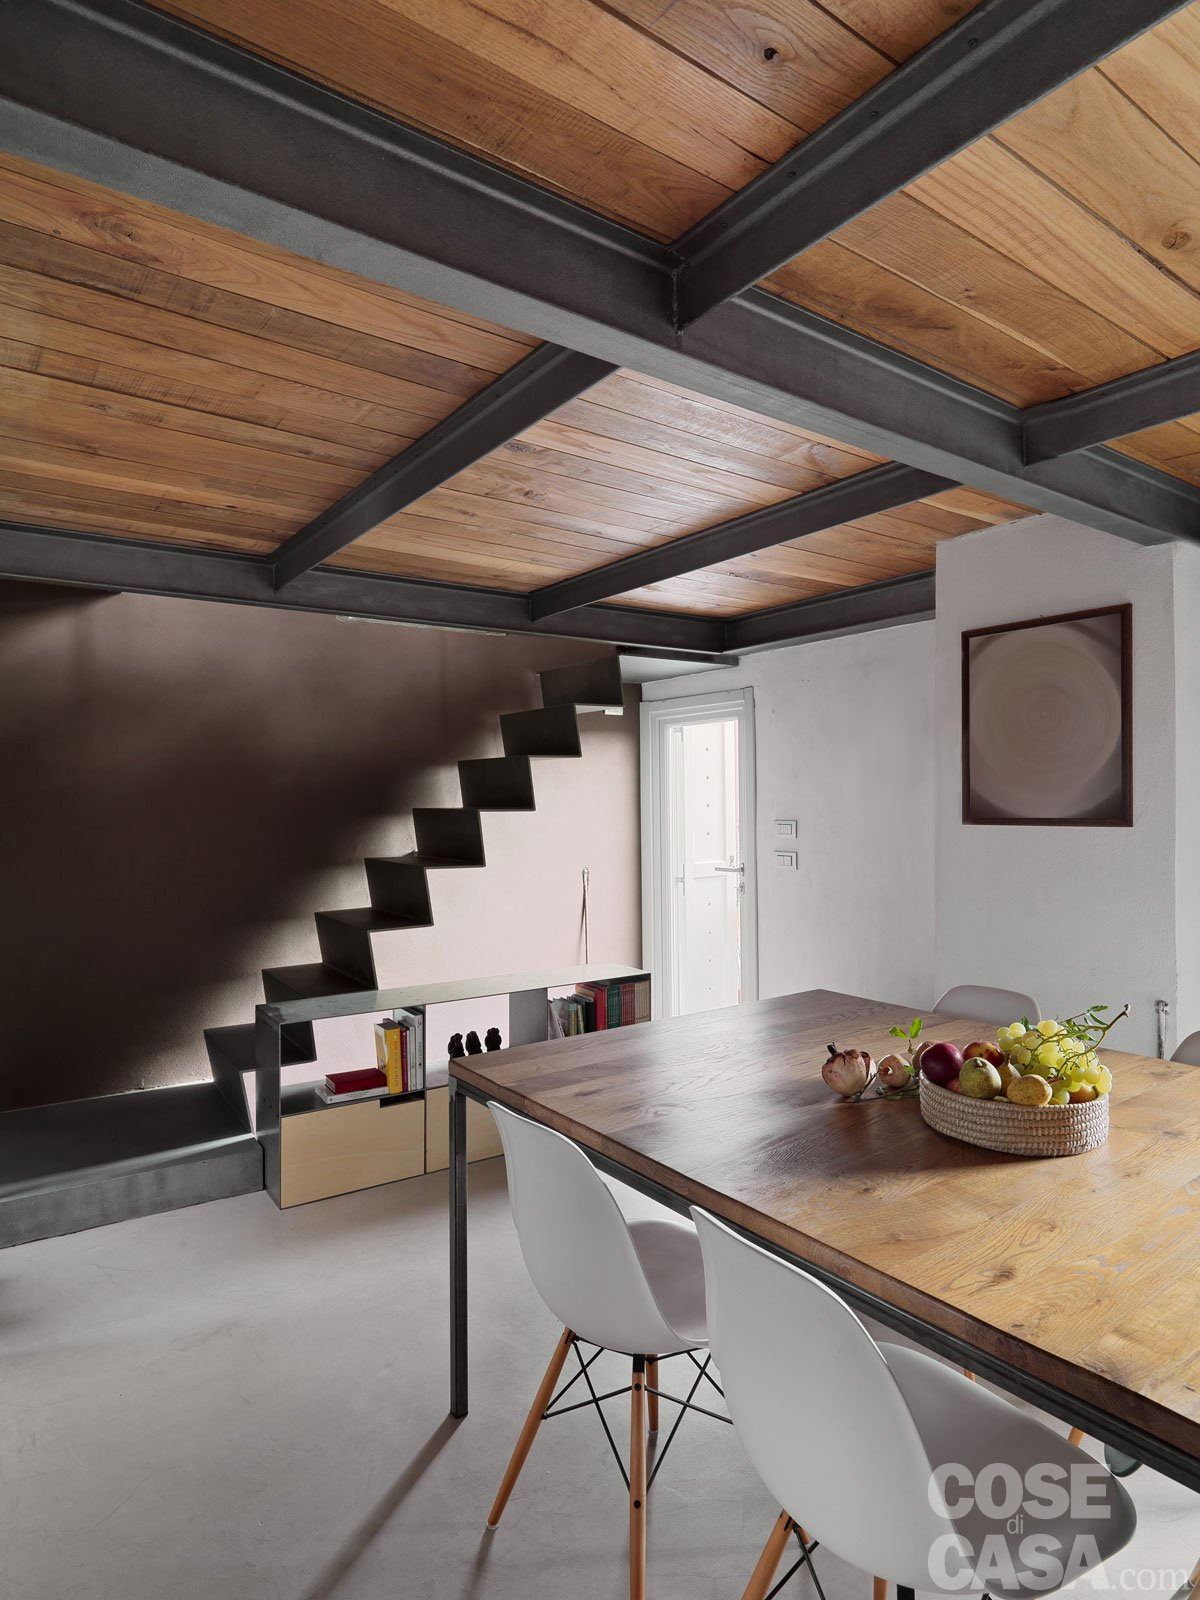 65 mq una casa che si sviluppa in verticale cose di casa for Immagini di casa